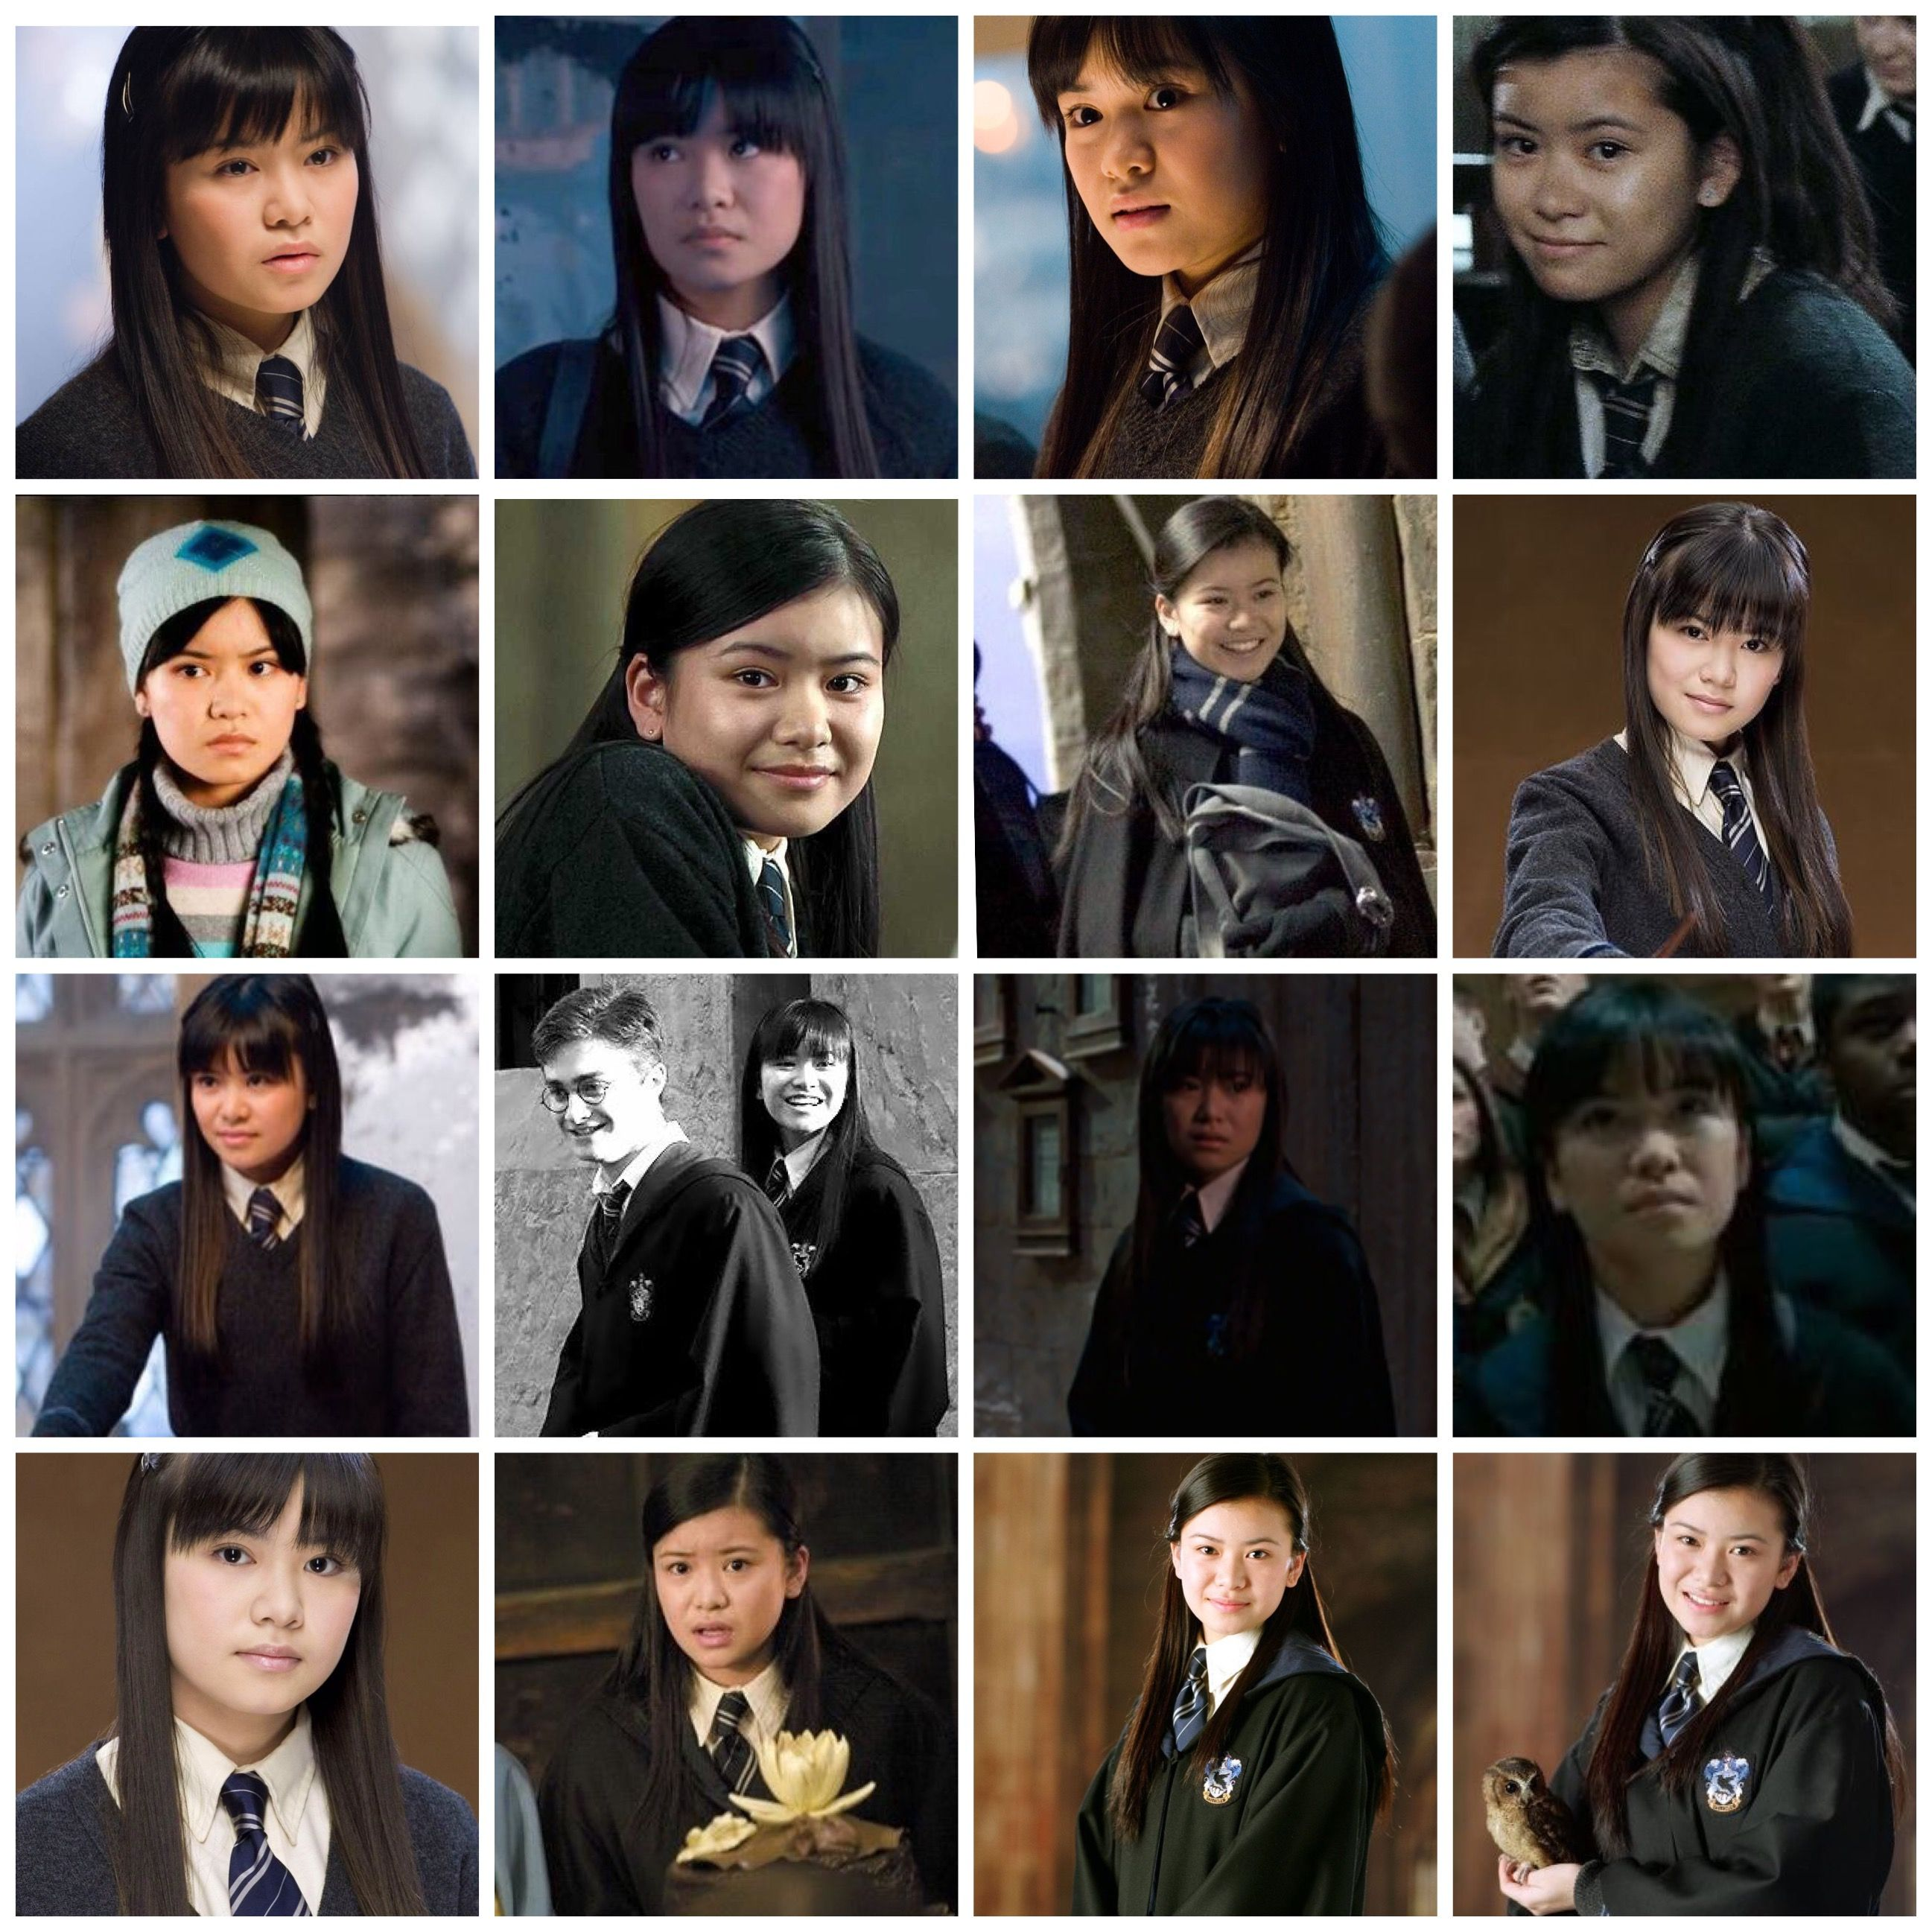 Pin By Slytherin Princess On Cho Harry Potter Character Quiz Celebrity Twins Harry Potter Cast